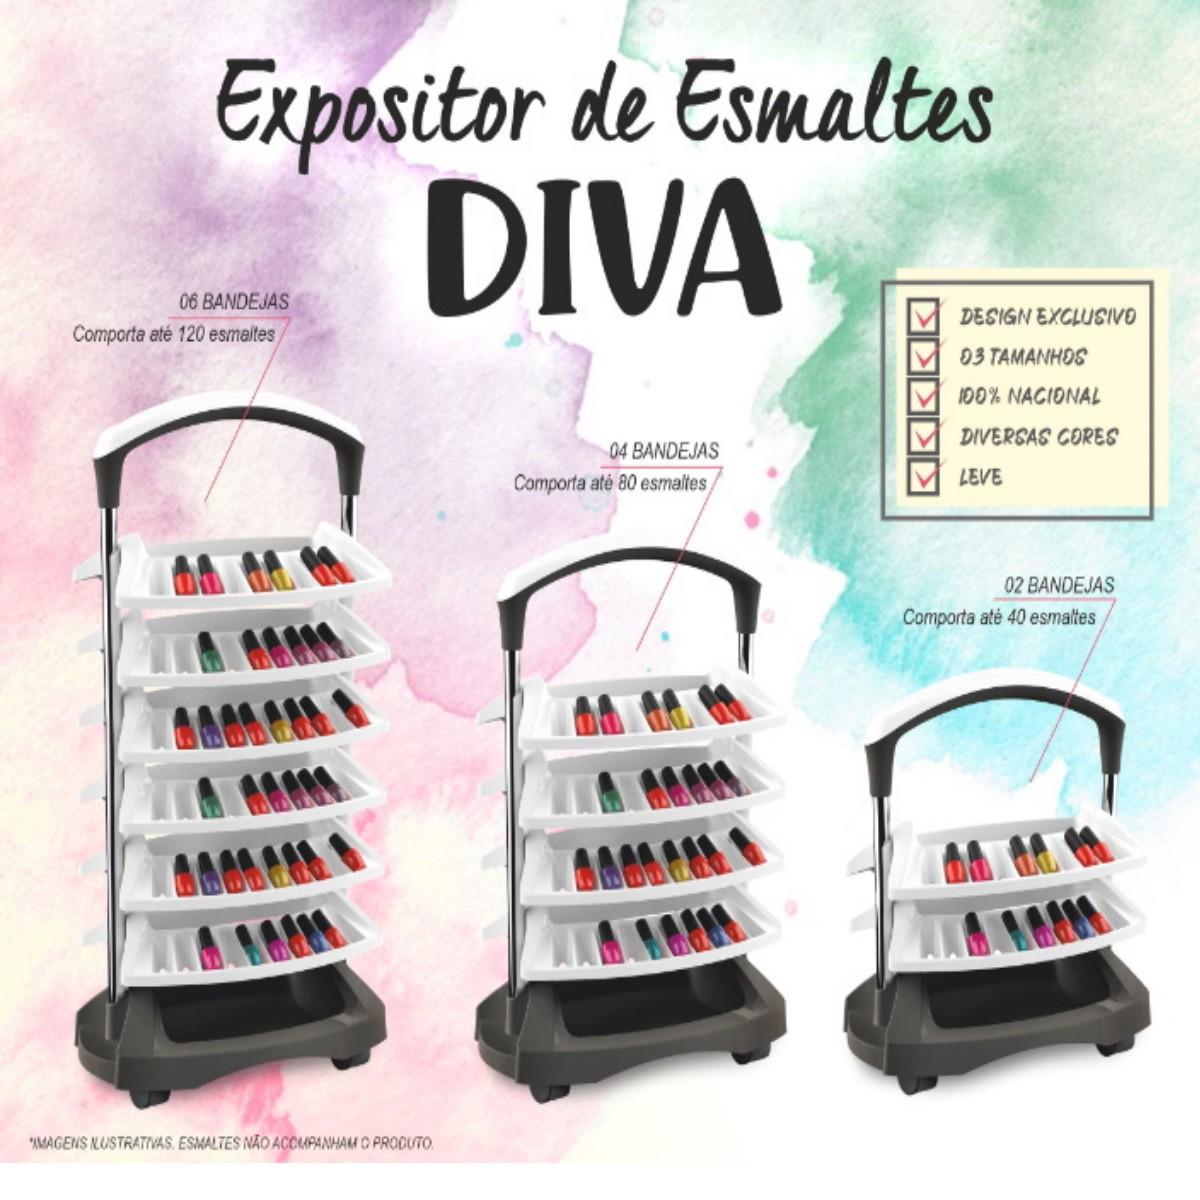 Carrinho Expositor de Esmaltes Diva 2 Bandejas (40 Esmaltes) Branco e Preto